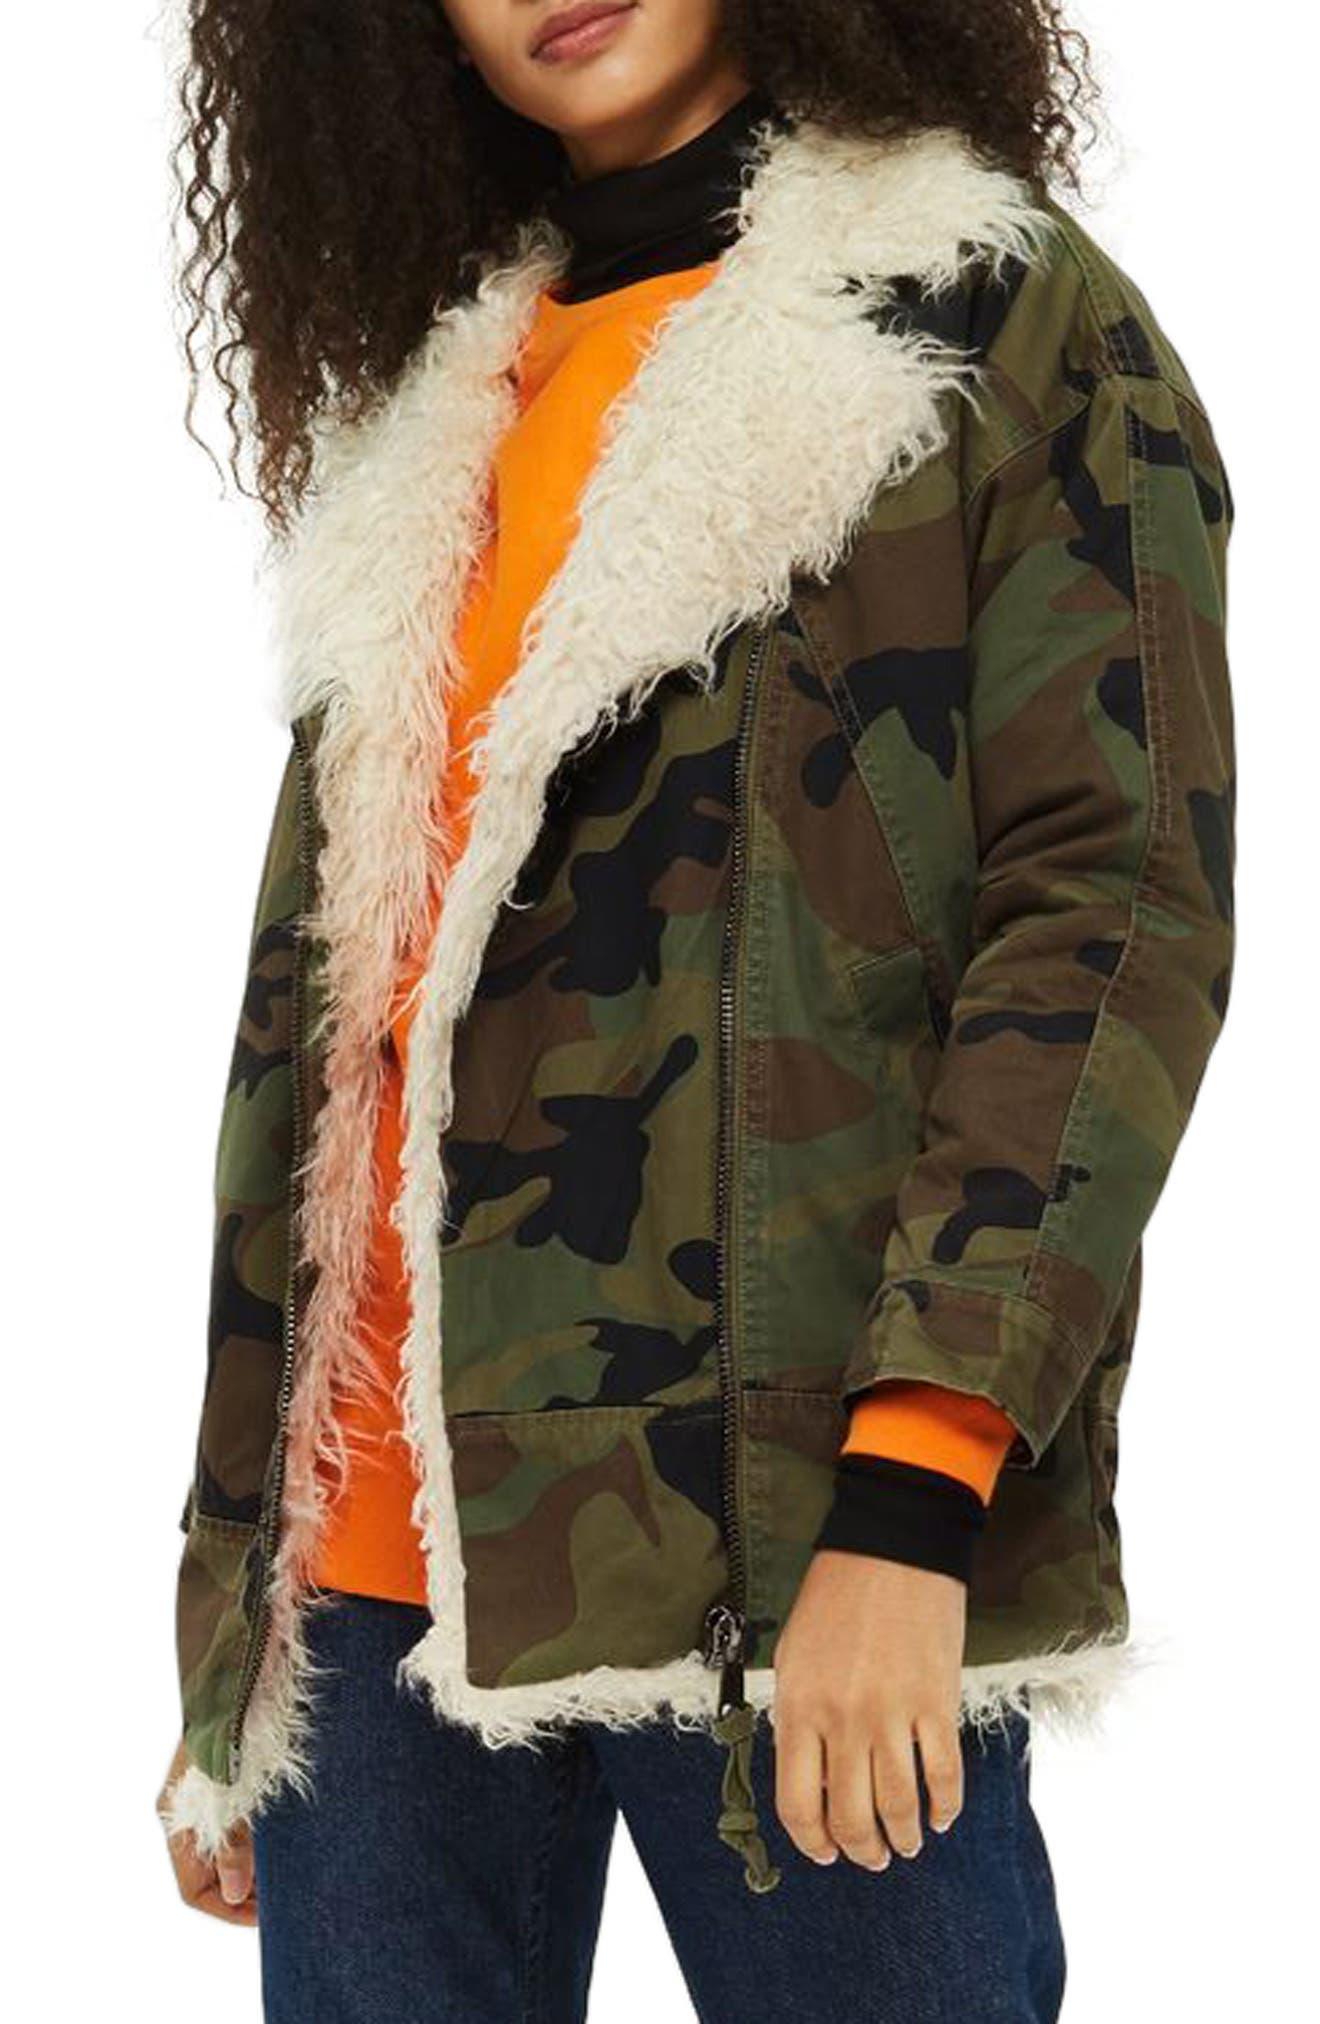 Alternate Image 1 Selected - Topshop Jake Camouflage Jacket